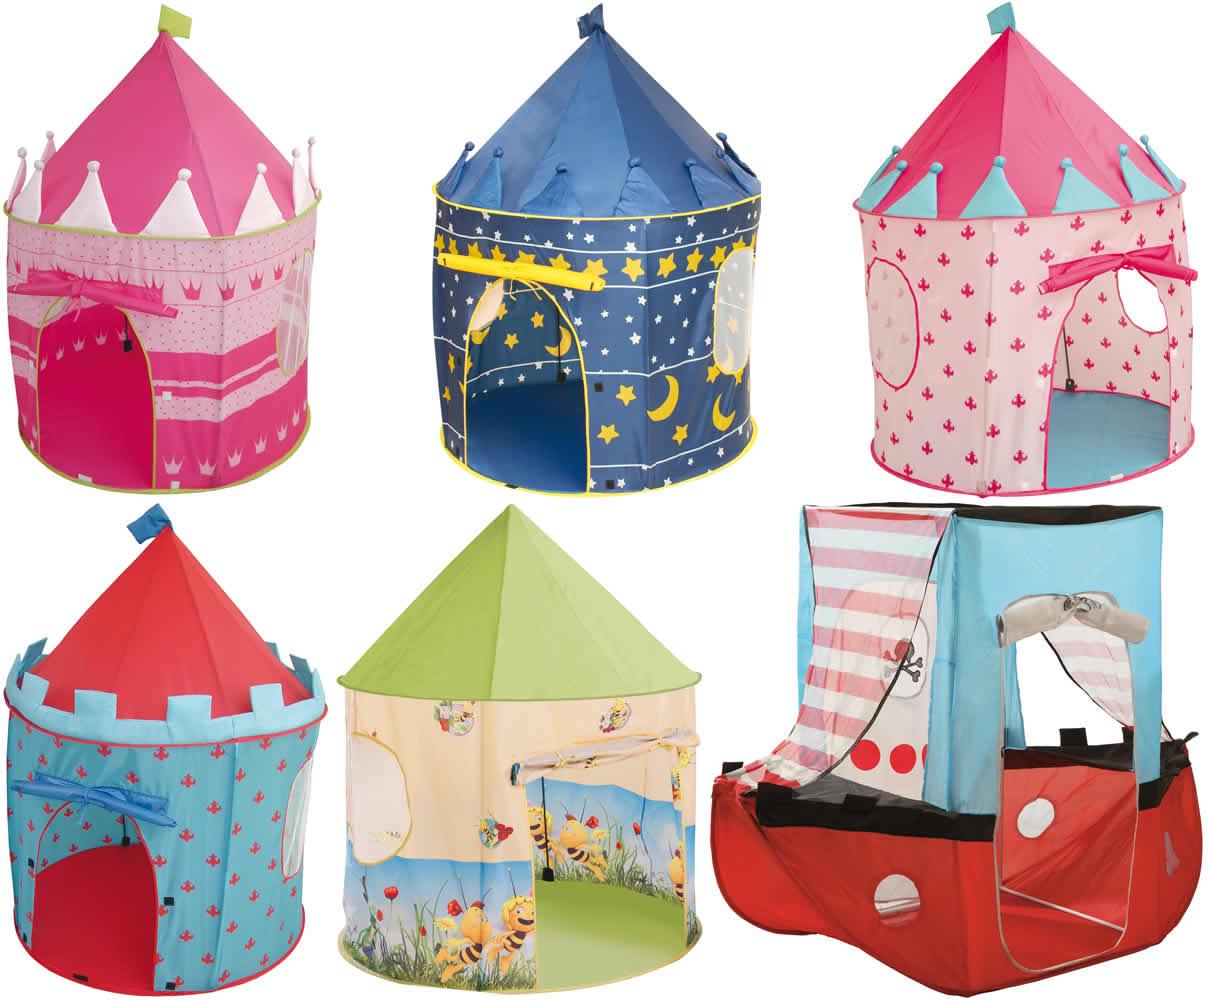 roba Spielzelt Kinderzelt Spielhaus Zelt | eBay